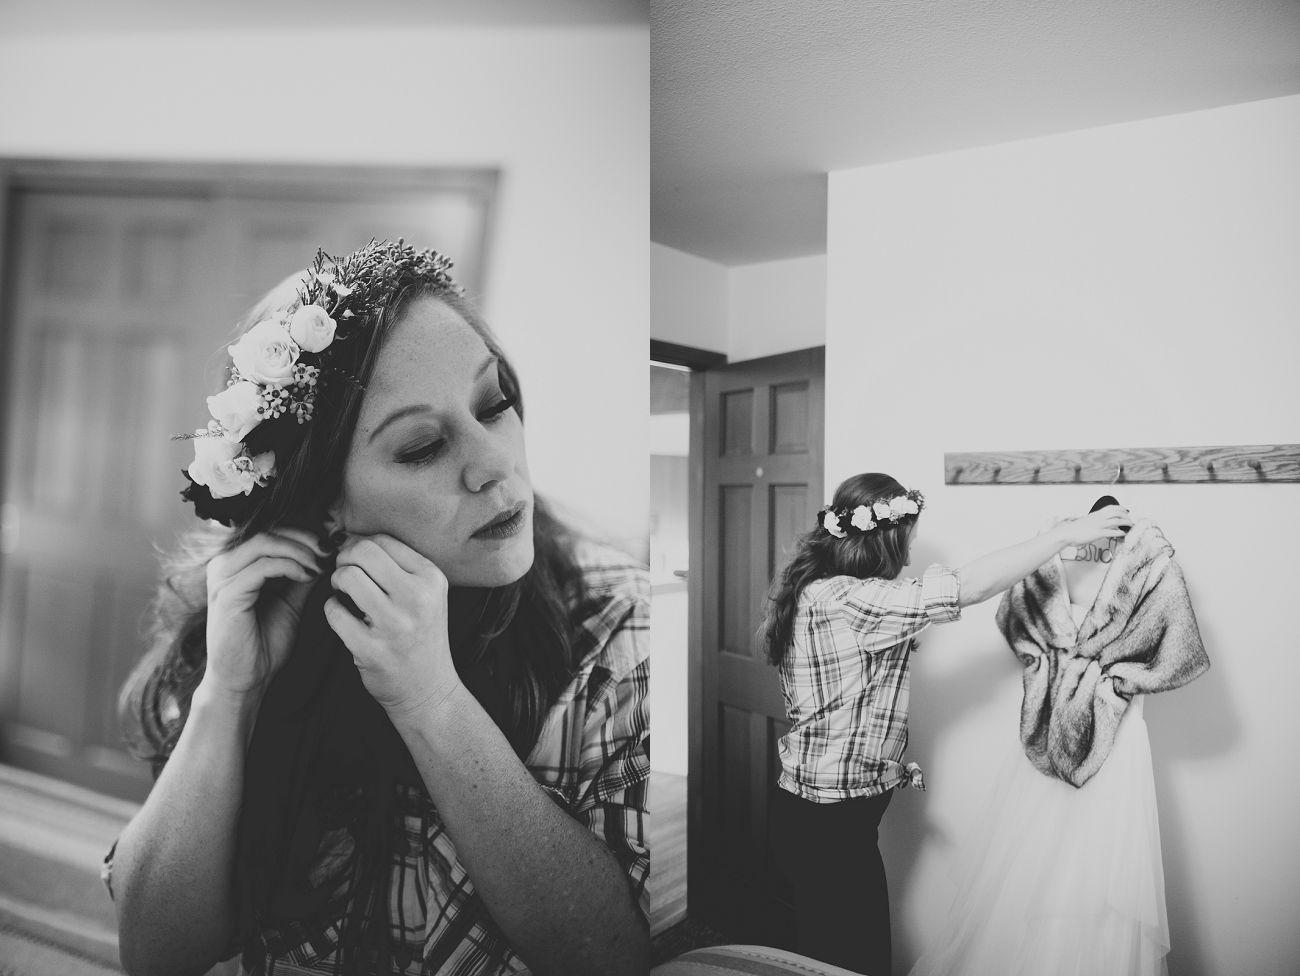 Jennifer_Mooney_Photo_Whitefish_mountain_resort_wedding_elegant_montana_wedding_025.jpg